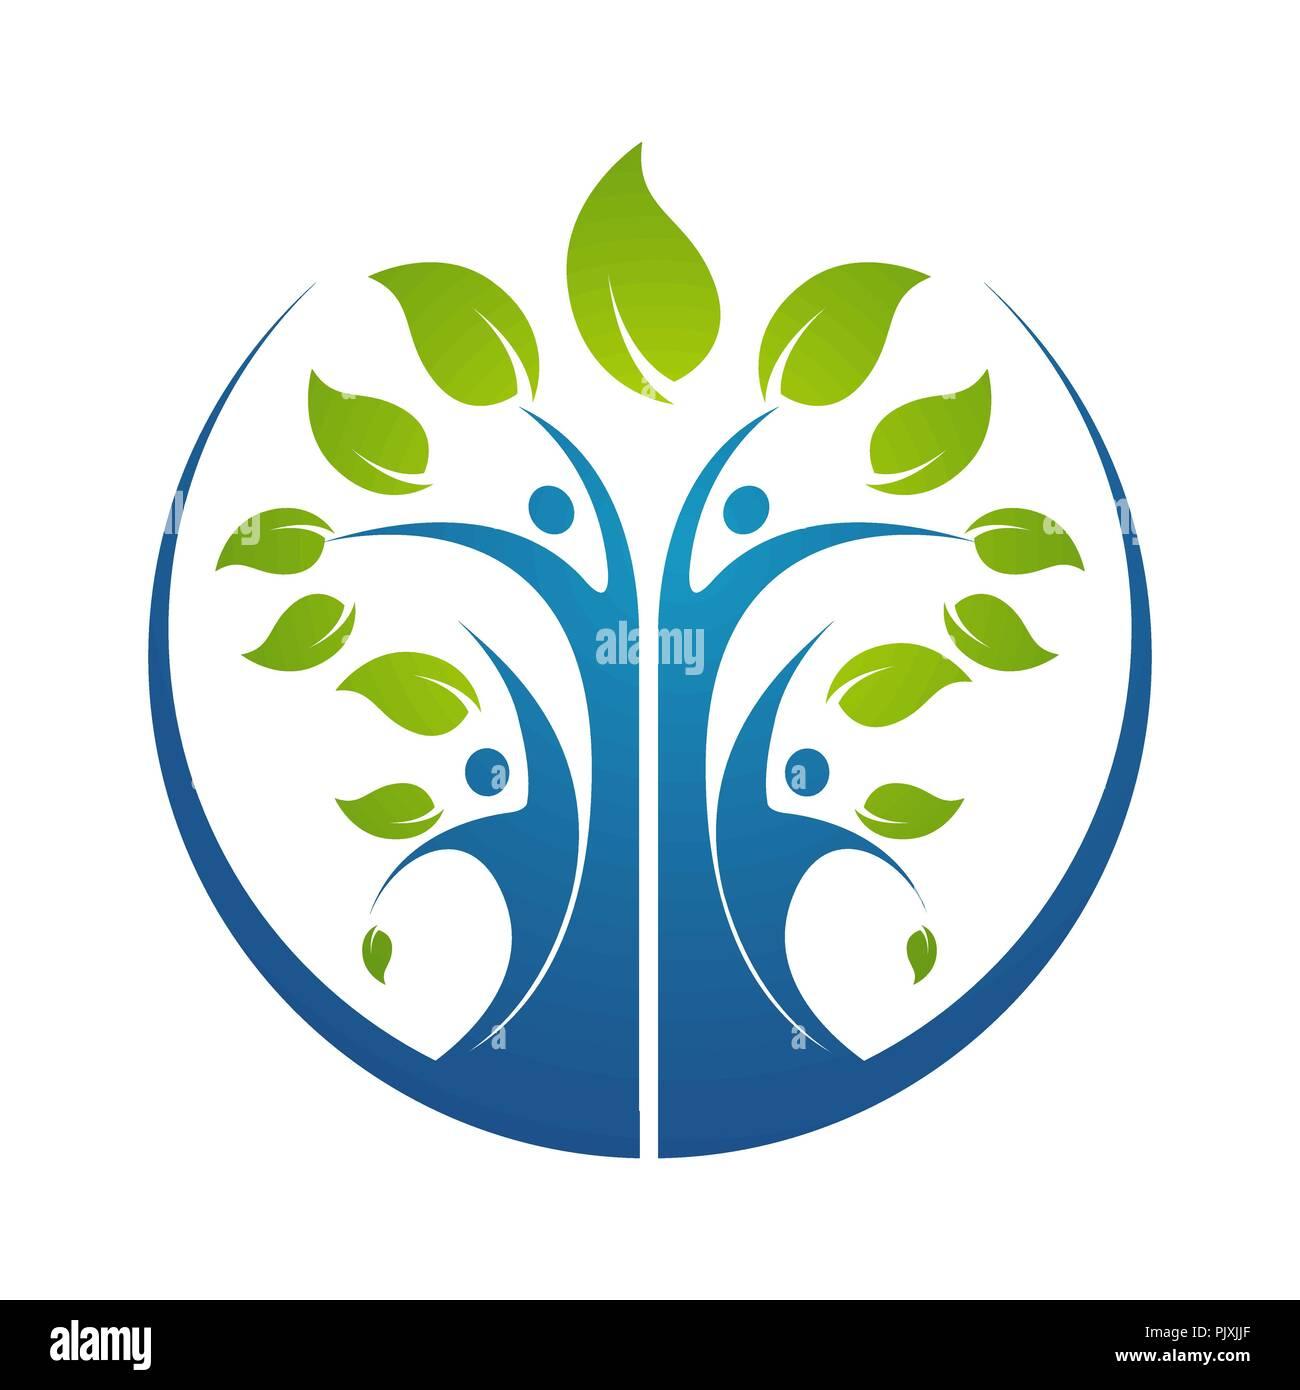 Family Tree Symbol Icon Logo Design Template Illustration Stock